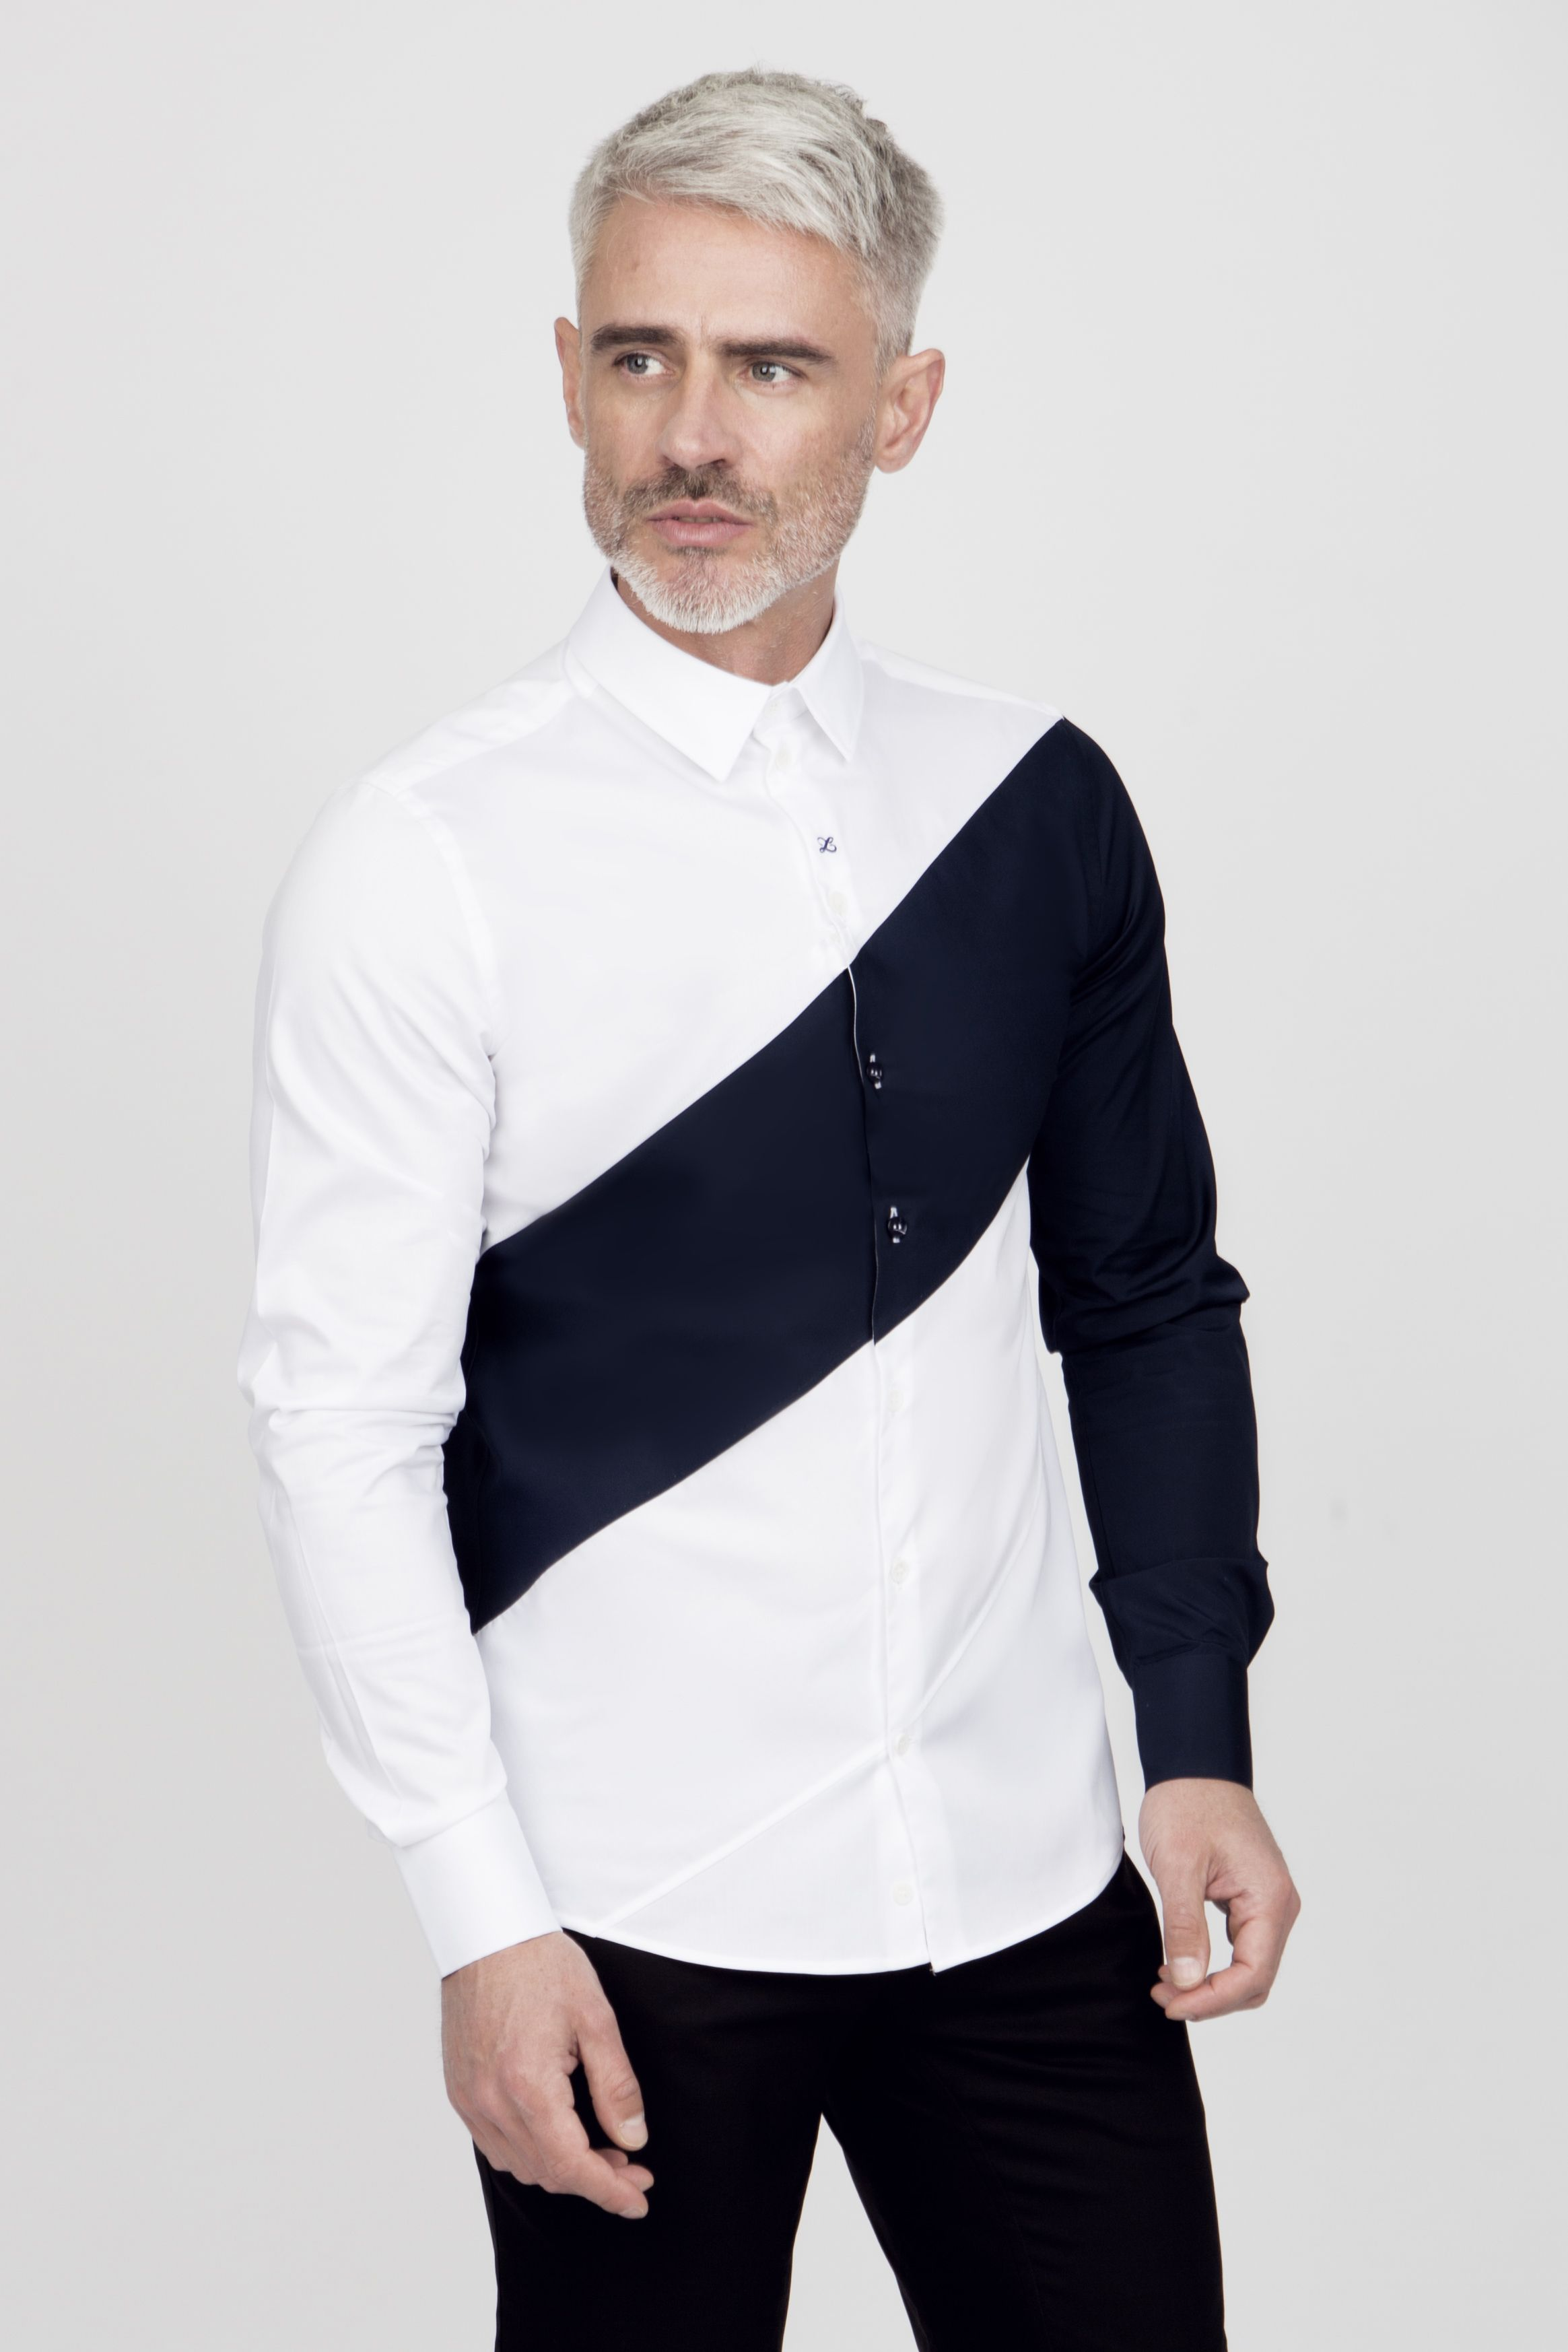 pingl par stephane p sur mode homme pinterest chemises africaines chemise et chemise homme. Black Bedroom Furniture Sets. Home Design Ideas